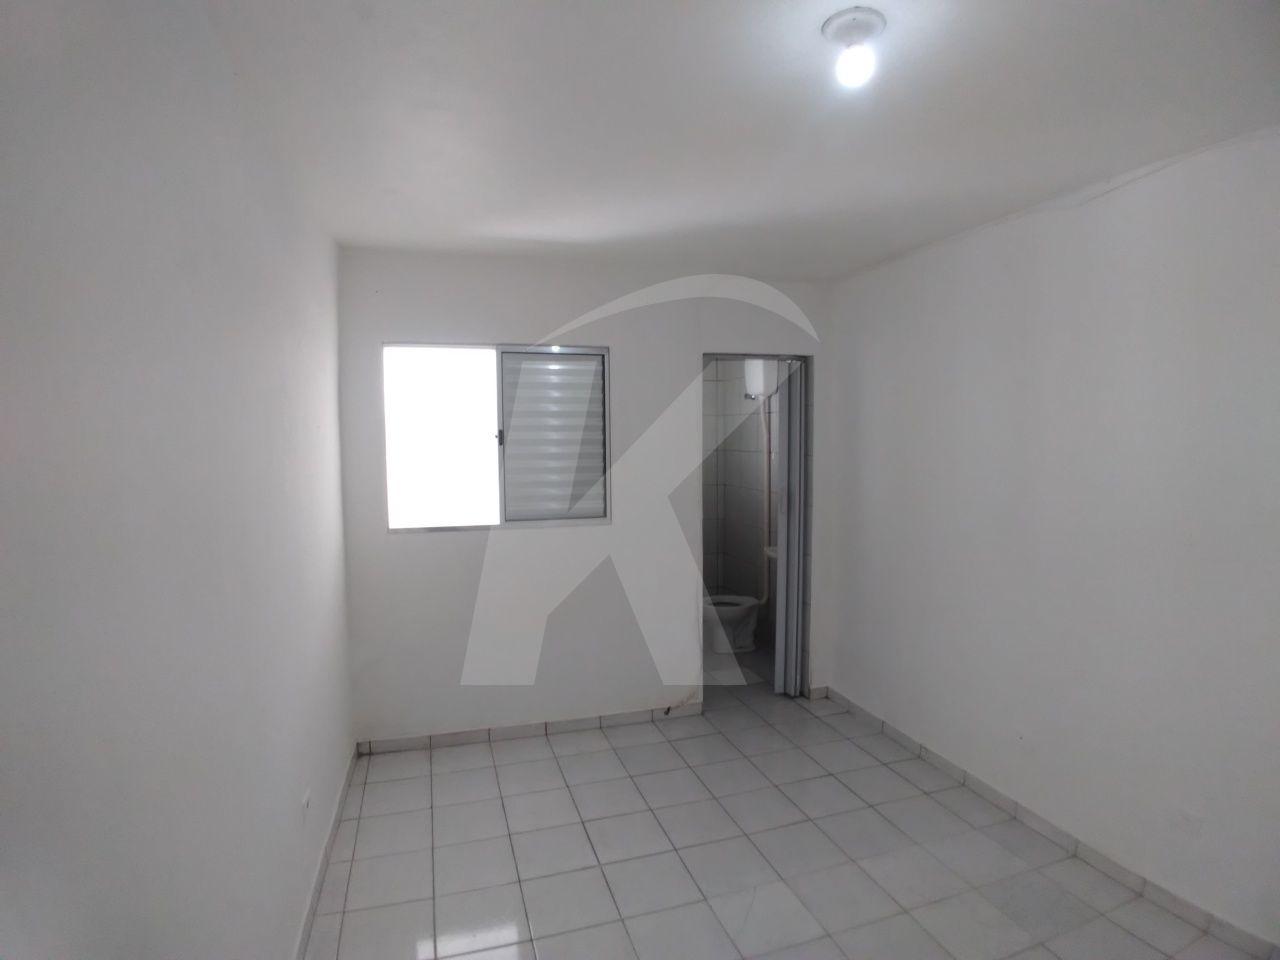 Casa  Tucuruvi - 1 Dormitório(s) - São Paulo - SP - REF. KA2859